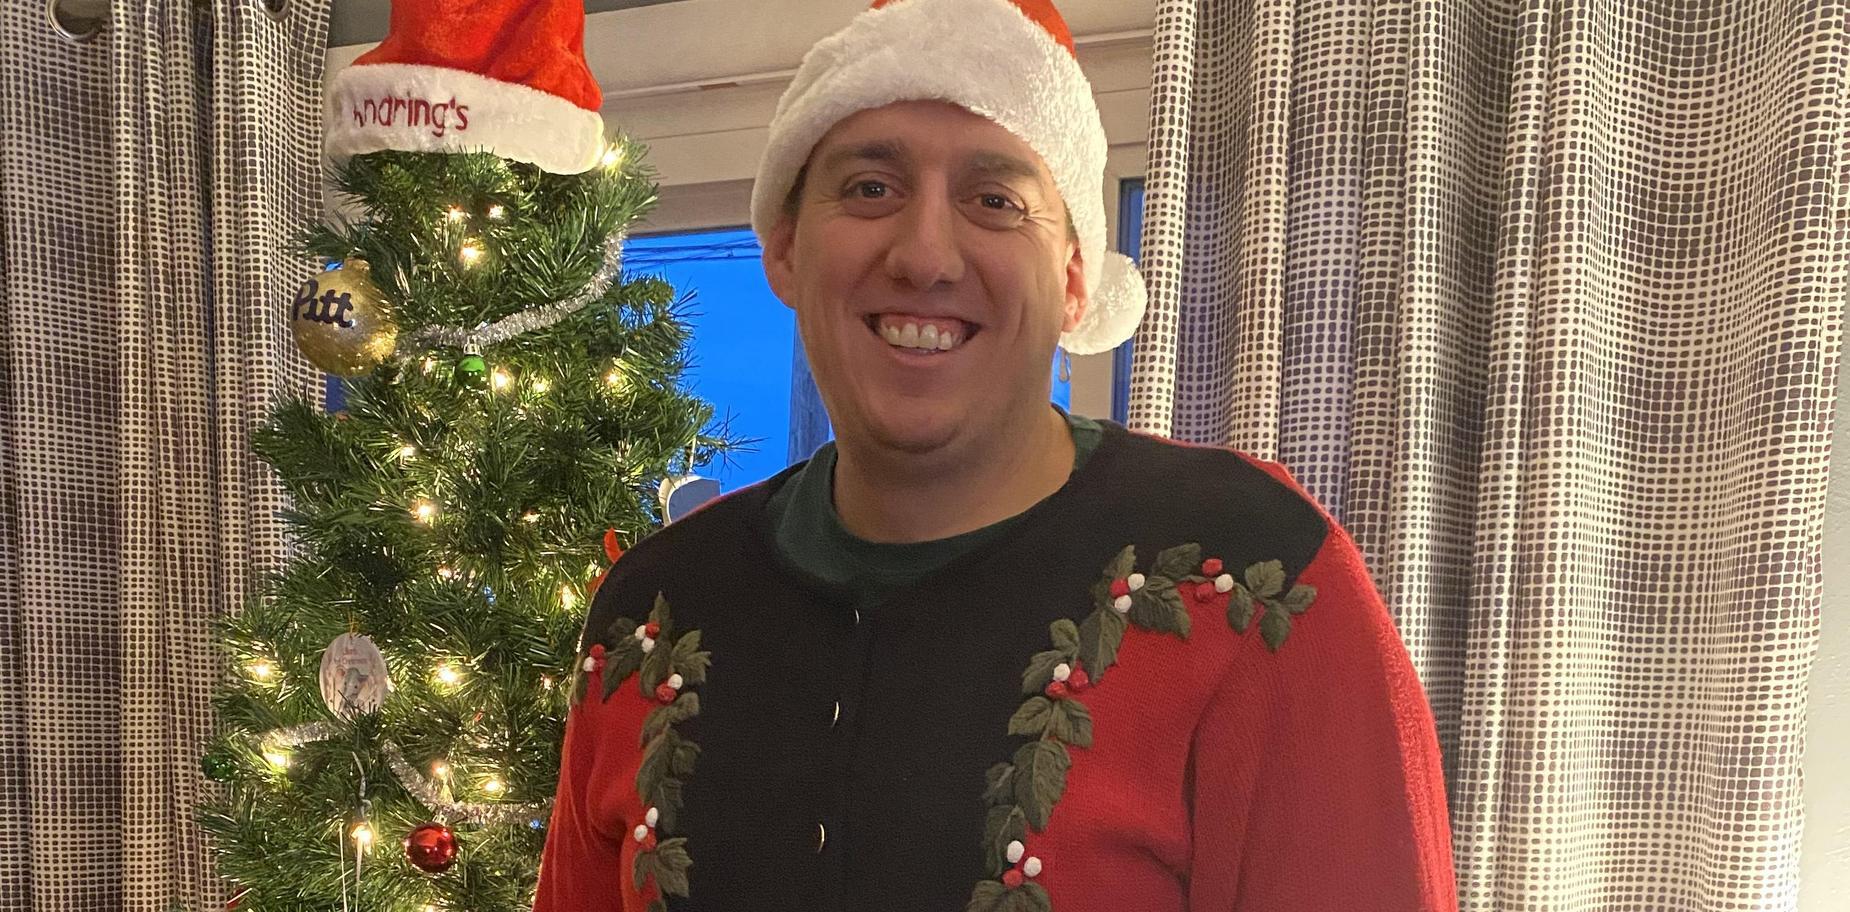 Teacher in Christmas attire